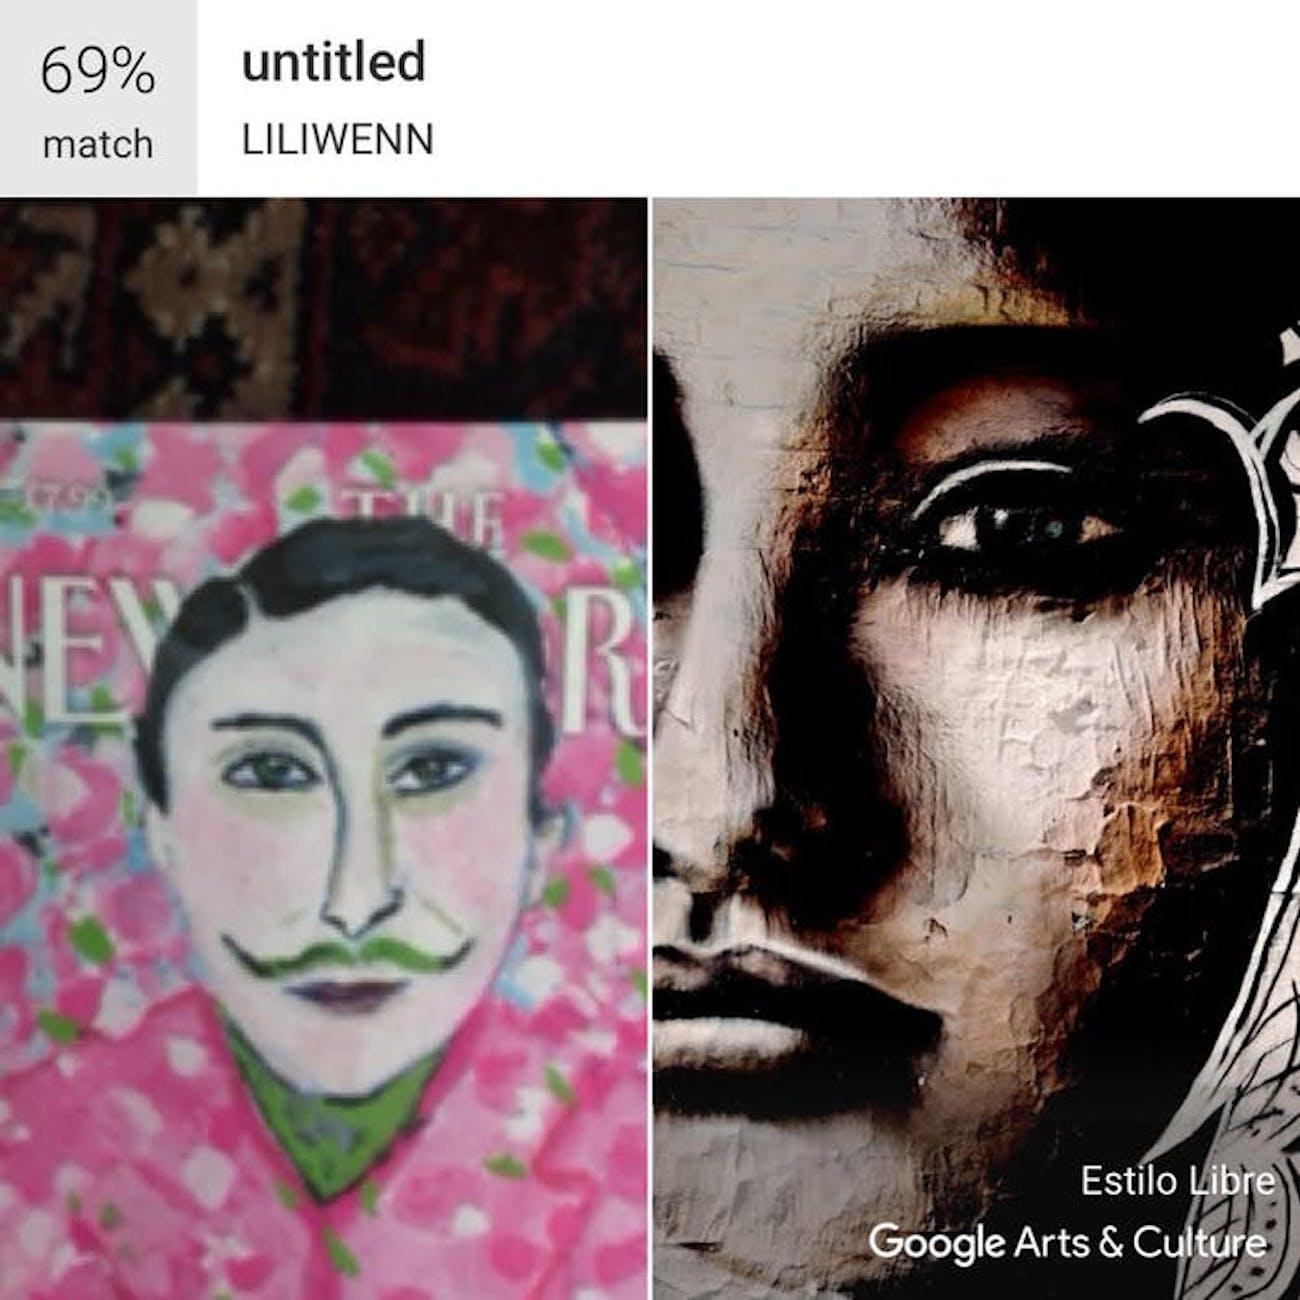 Google Arts and Culture face match app